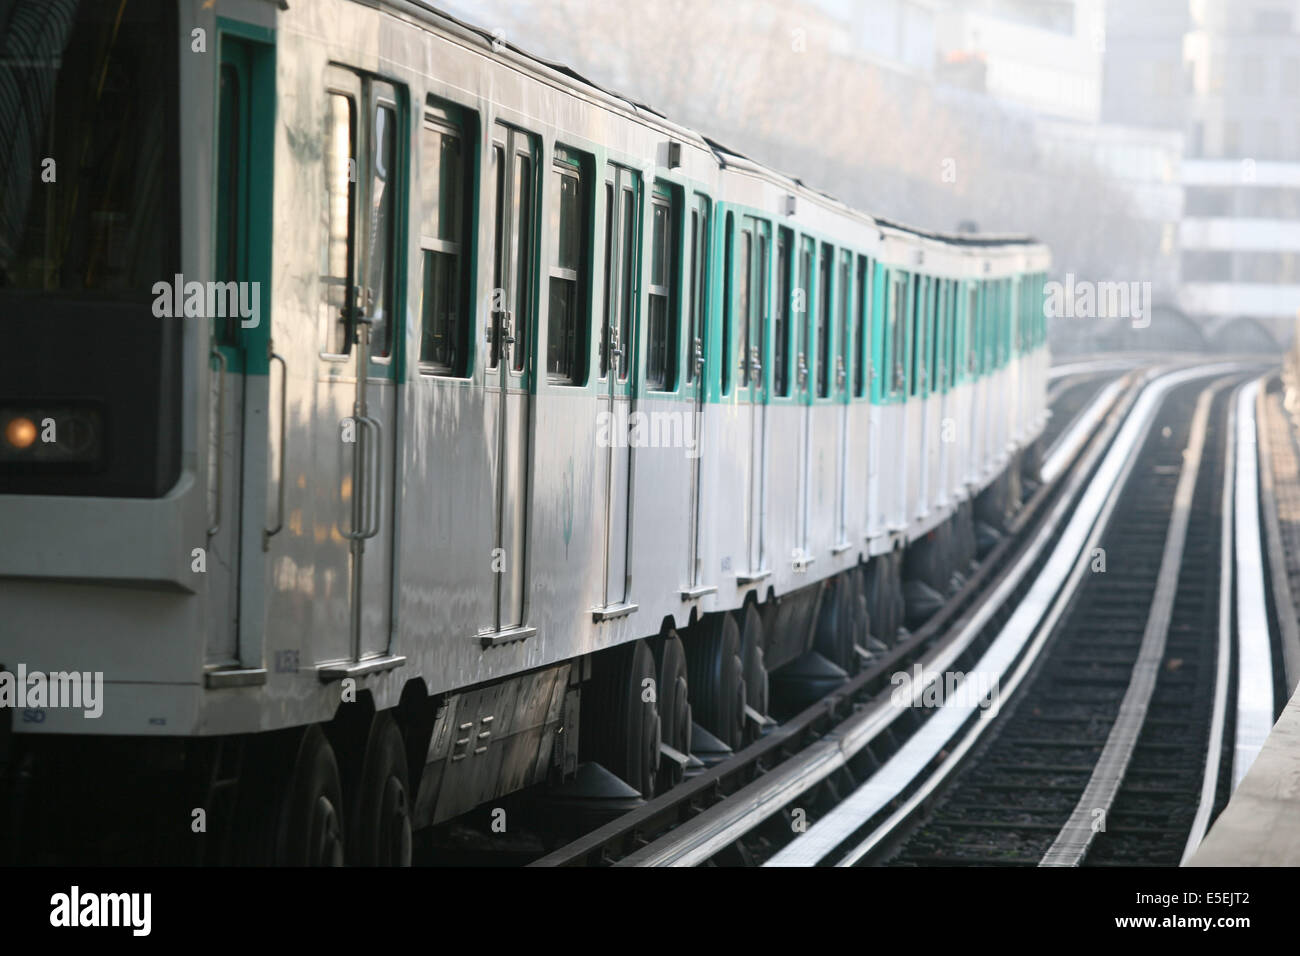 France, paris 13e - metro aerien, quai de la gare, rails, ratp, - Stock Image